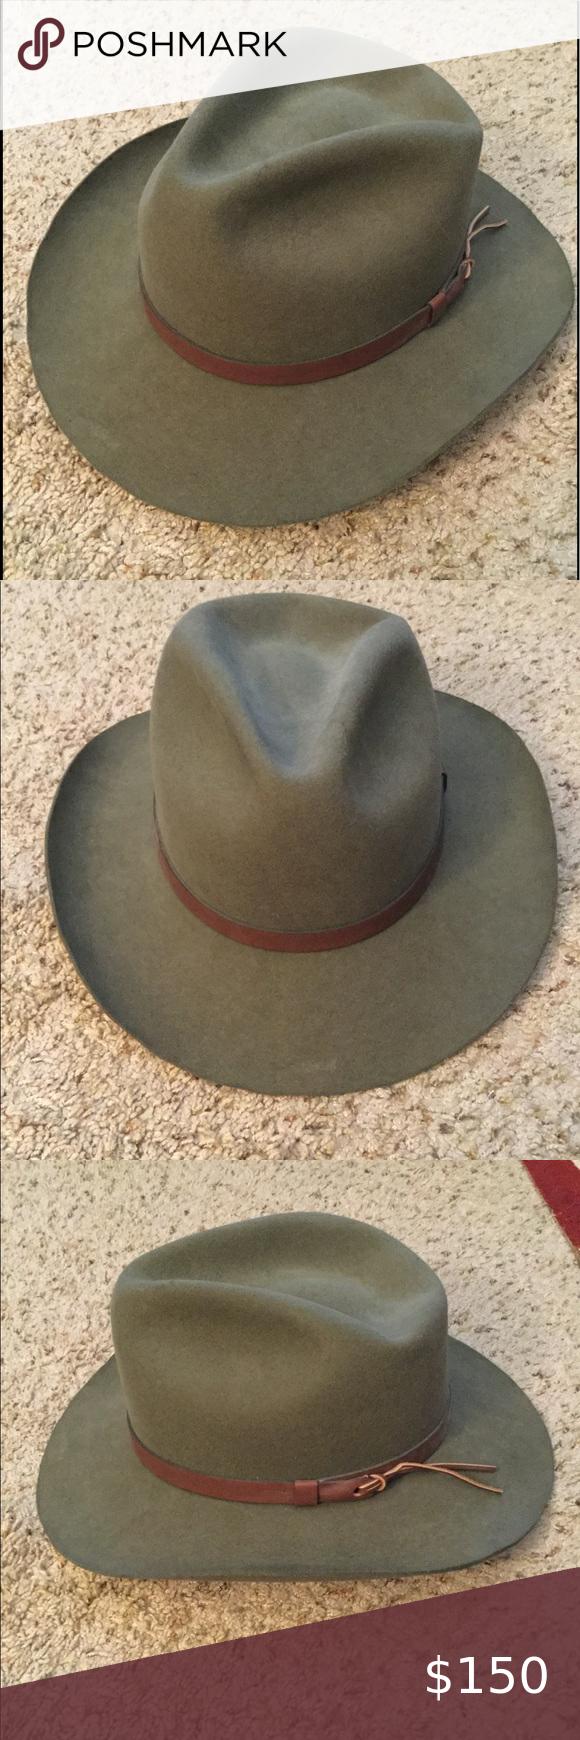 Vintage Stetson Mallory Outland Cowboy Western Hat Western Cowboy Hats Western Hats Stetson